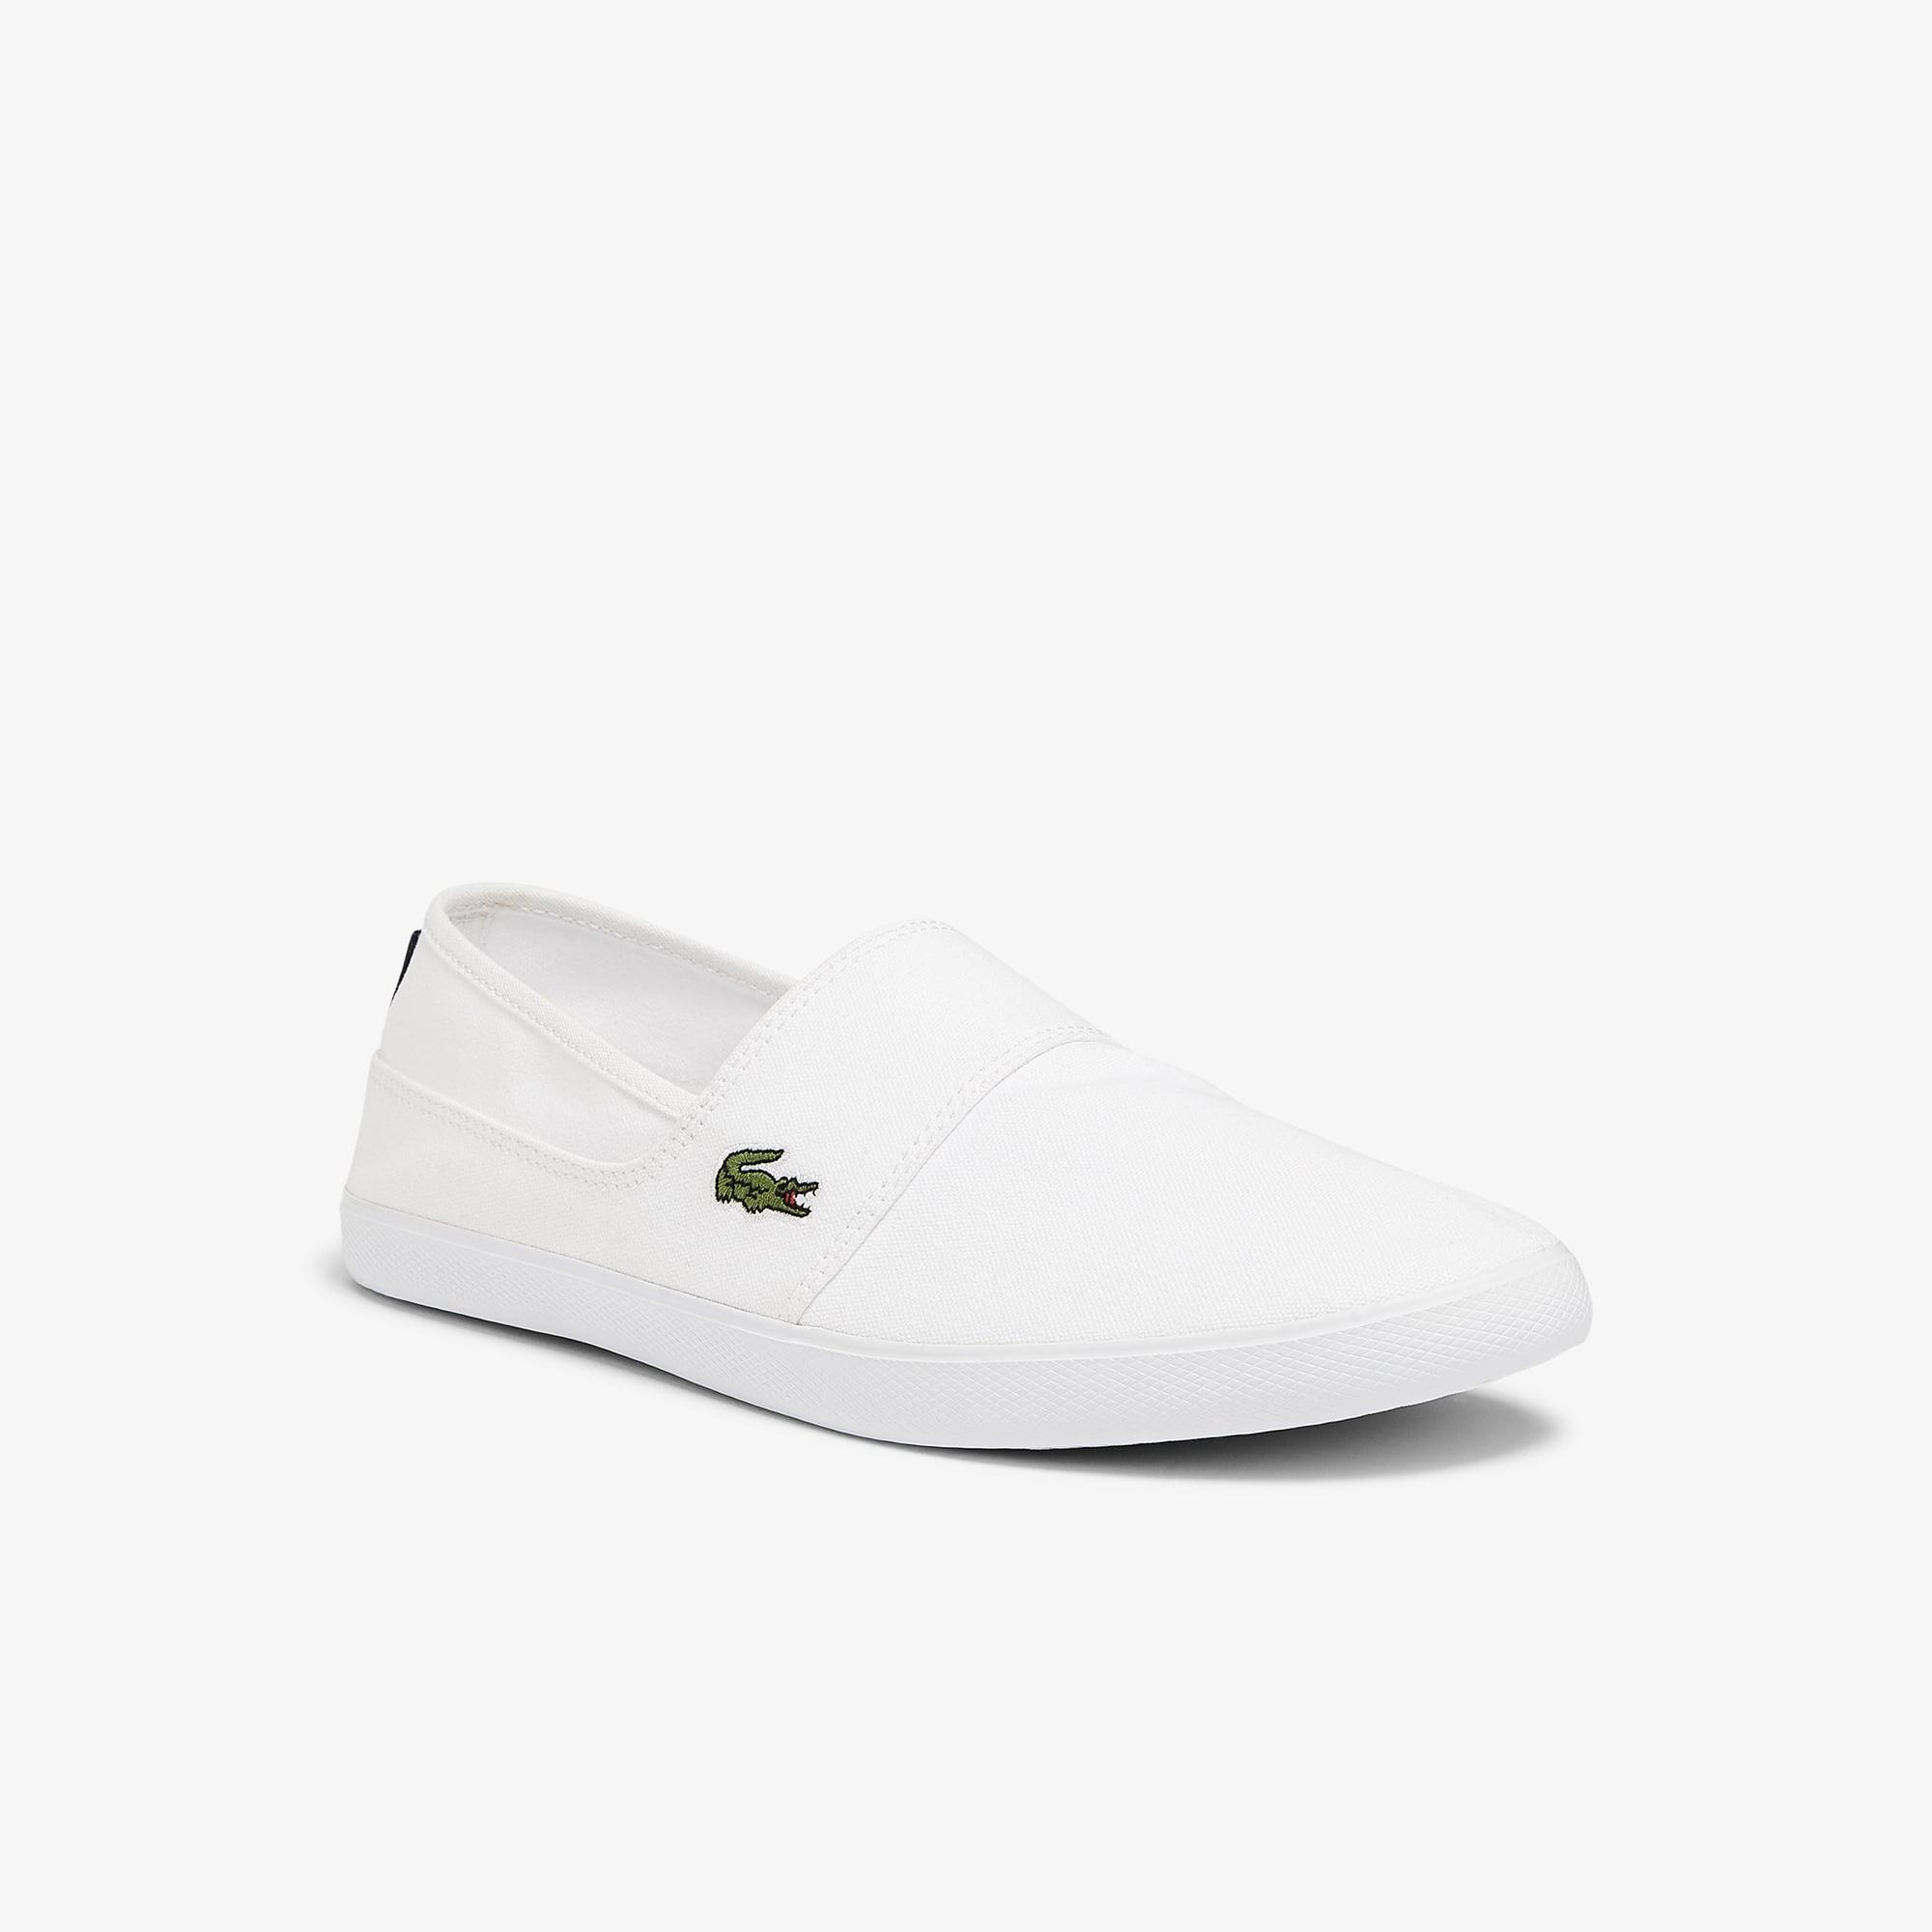 20227d7167a Polo shirts, shoes, leather goods | LACOSTE Online Boutique